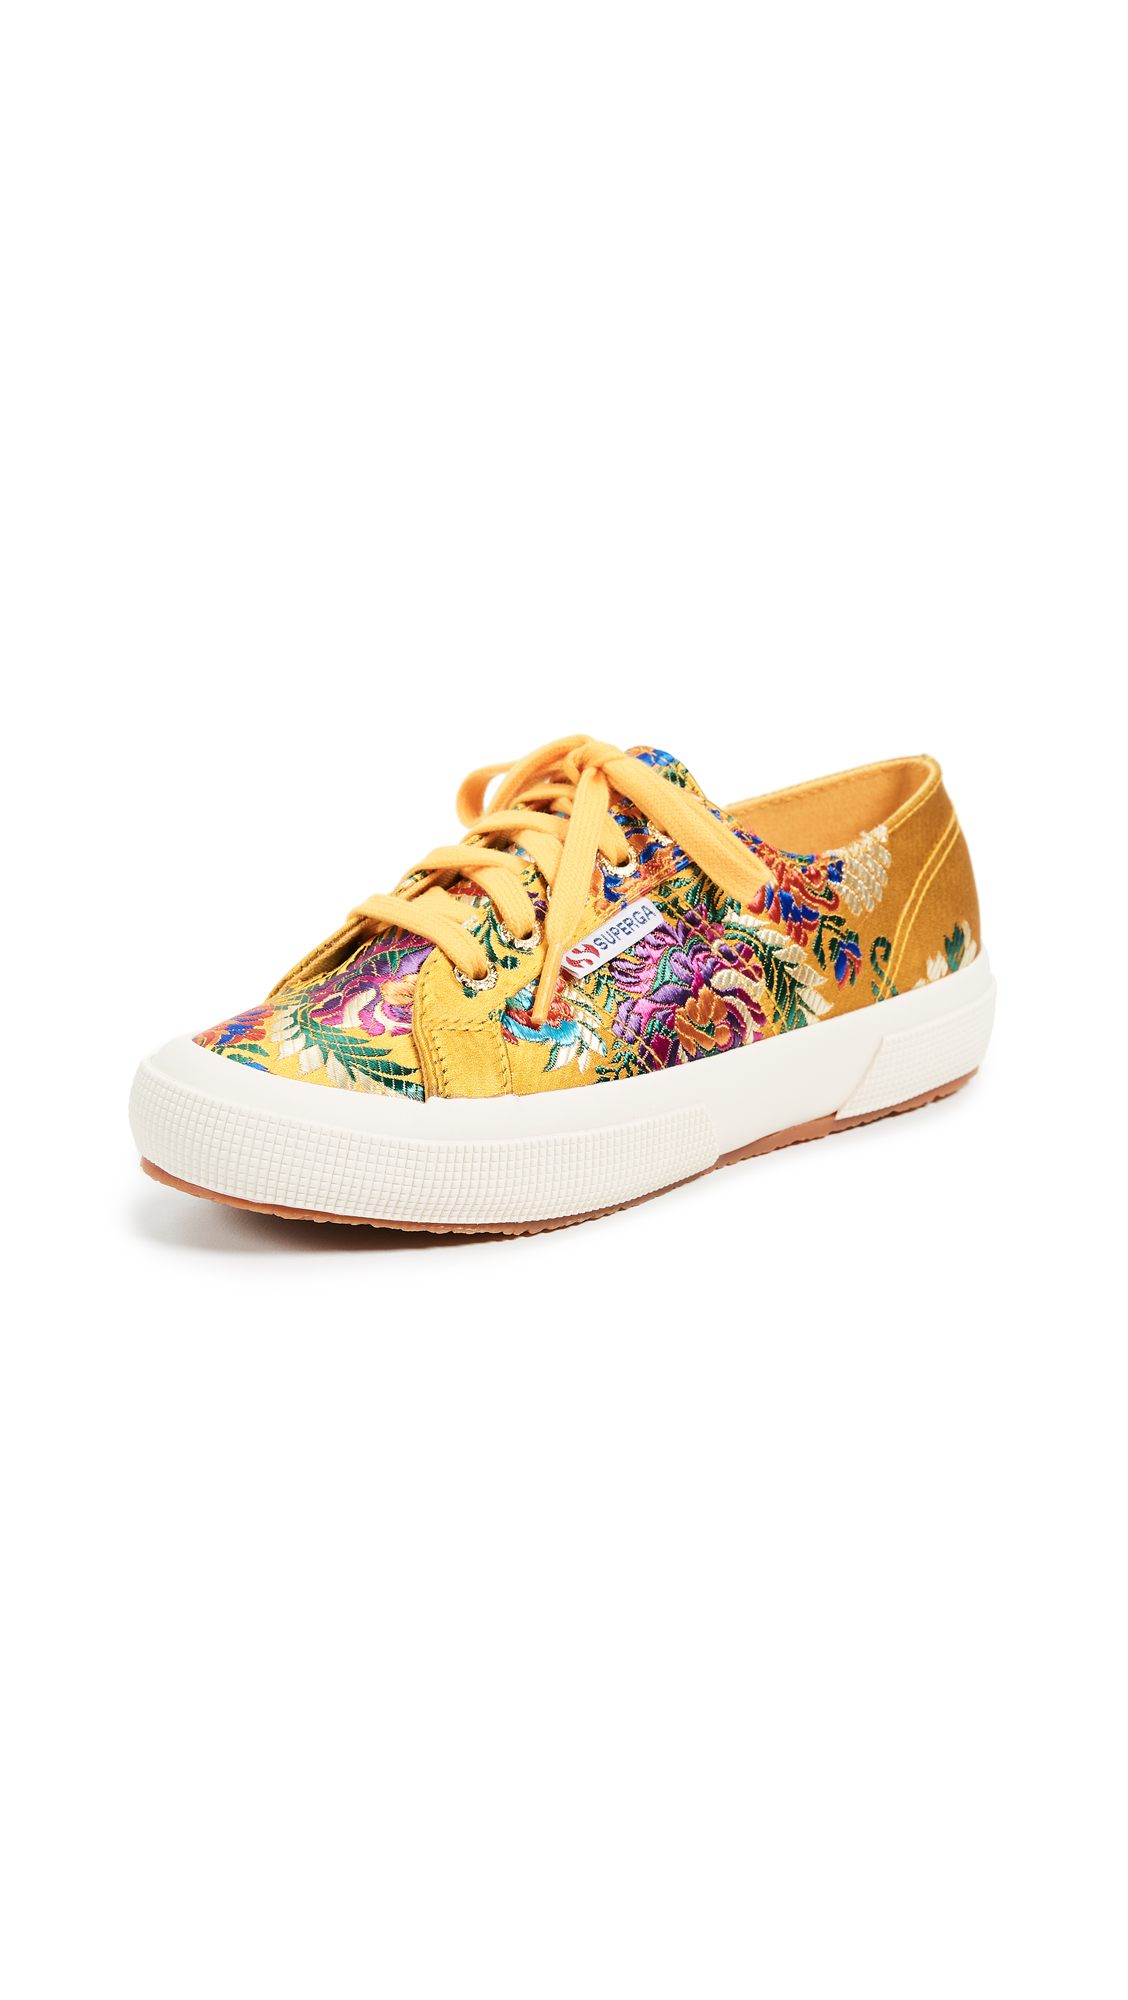 Superga 2750 Korelaw Brocade Sneakers - Mustard